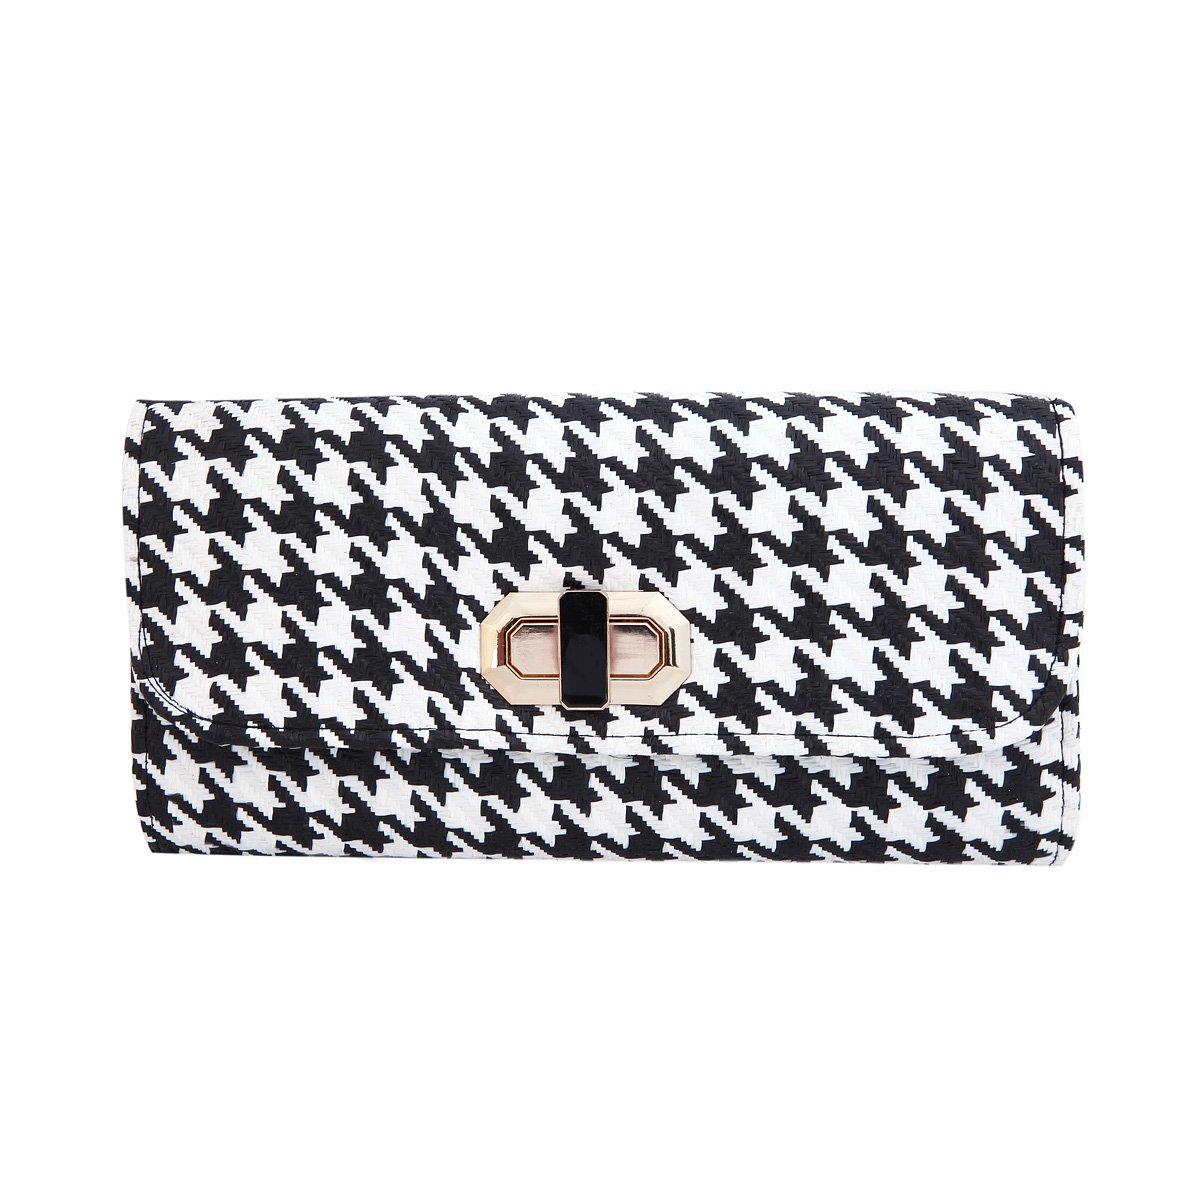 Classic Houndstooth Turnlock Flap Straw Clutch Bag Handbag, Black & White